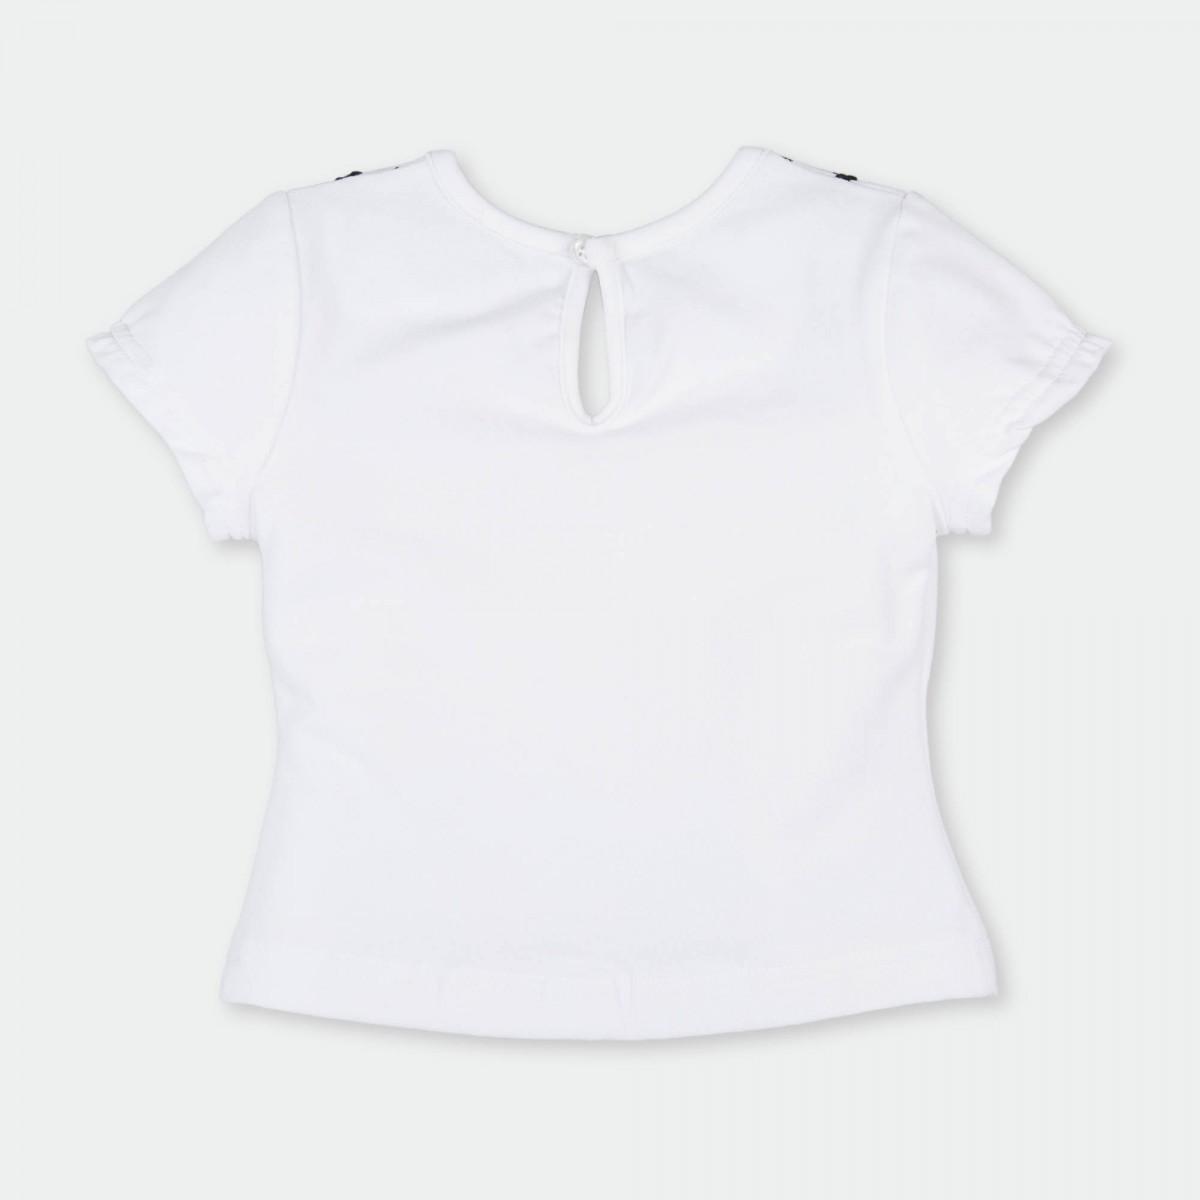 Camiseta_2743S17